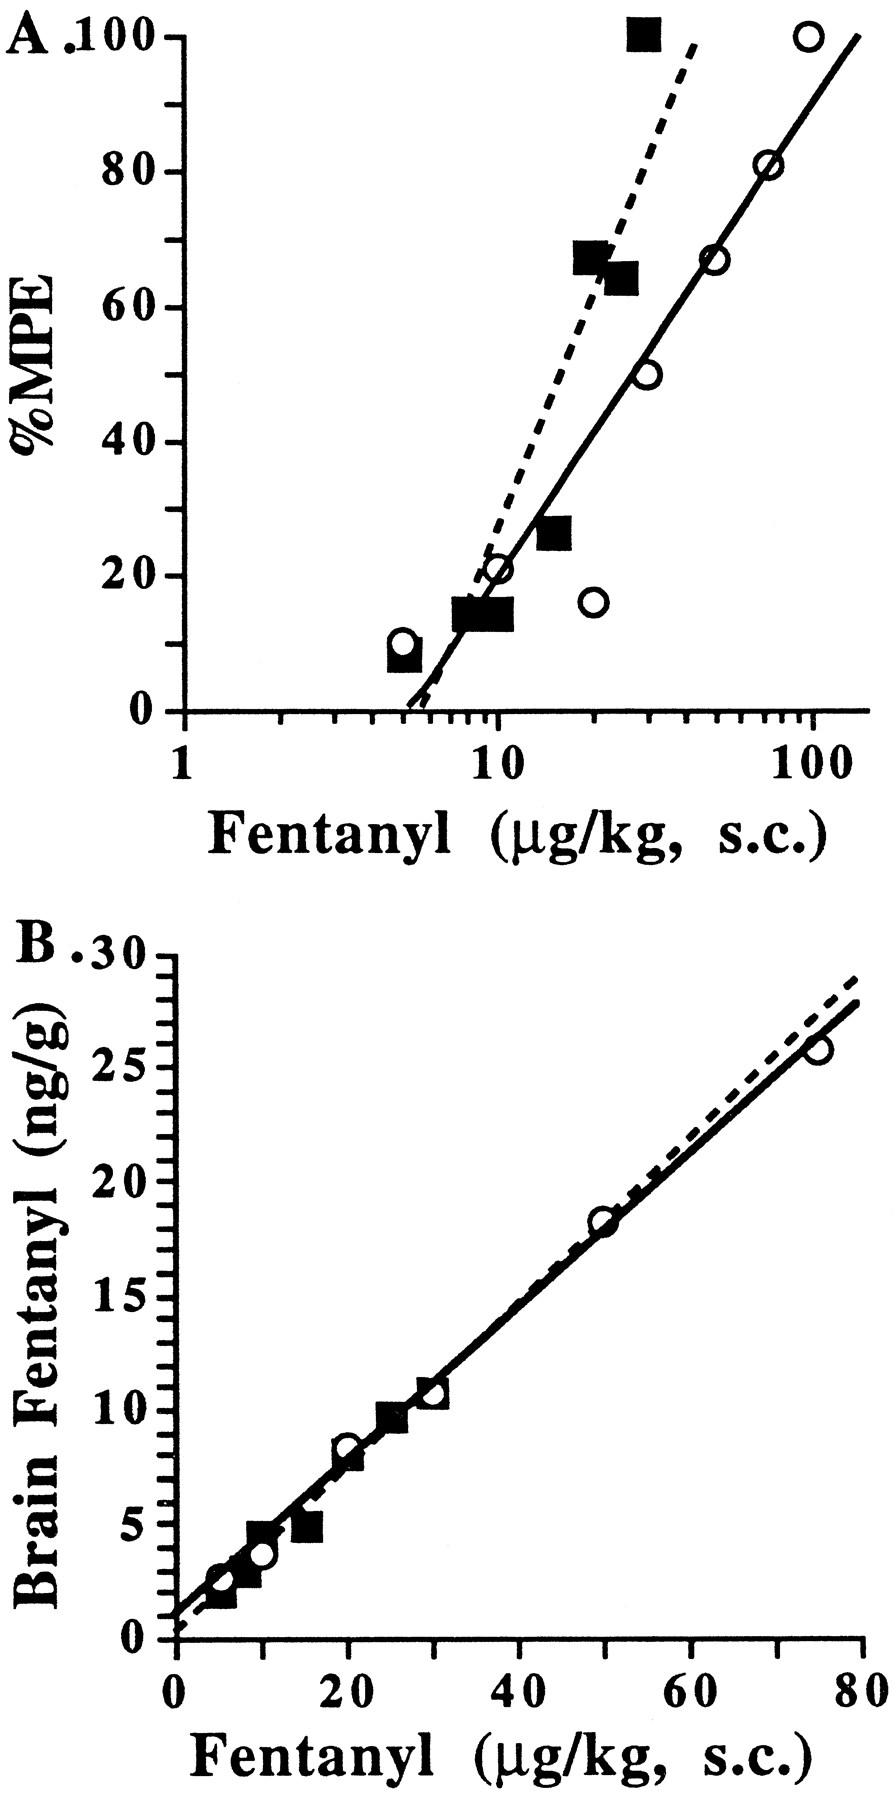 Characterization of Neonatal Rat Fentanyl Tolerance and